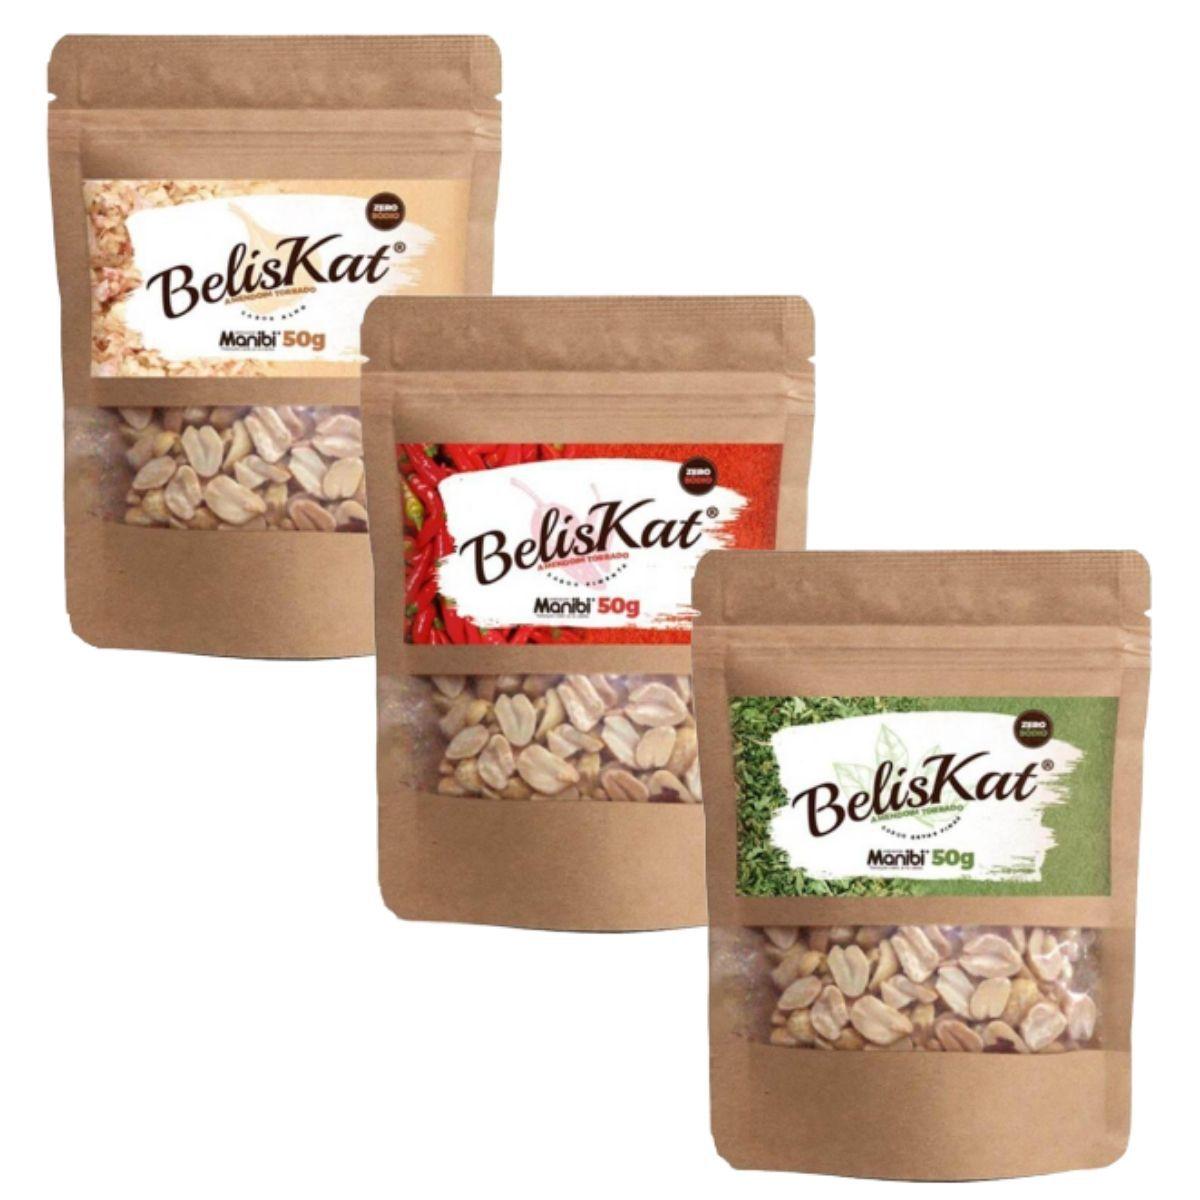 Beliskat - Amendoim Torrado Snack 50g - Manibi